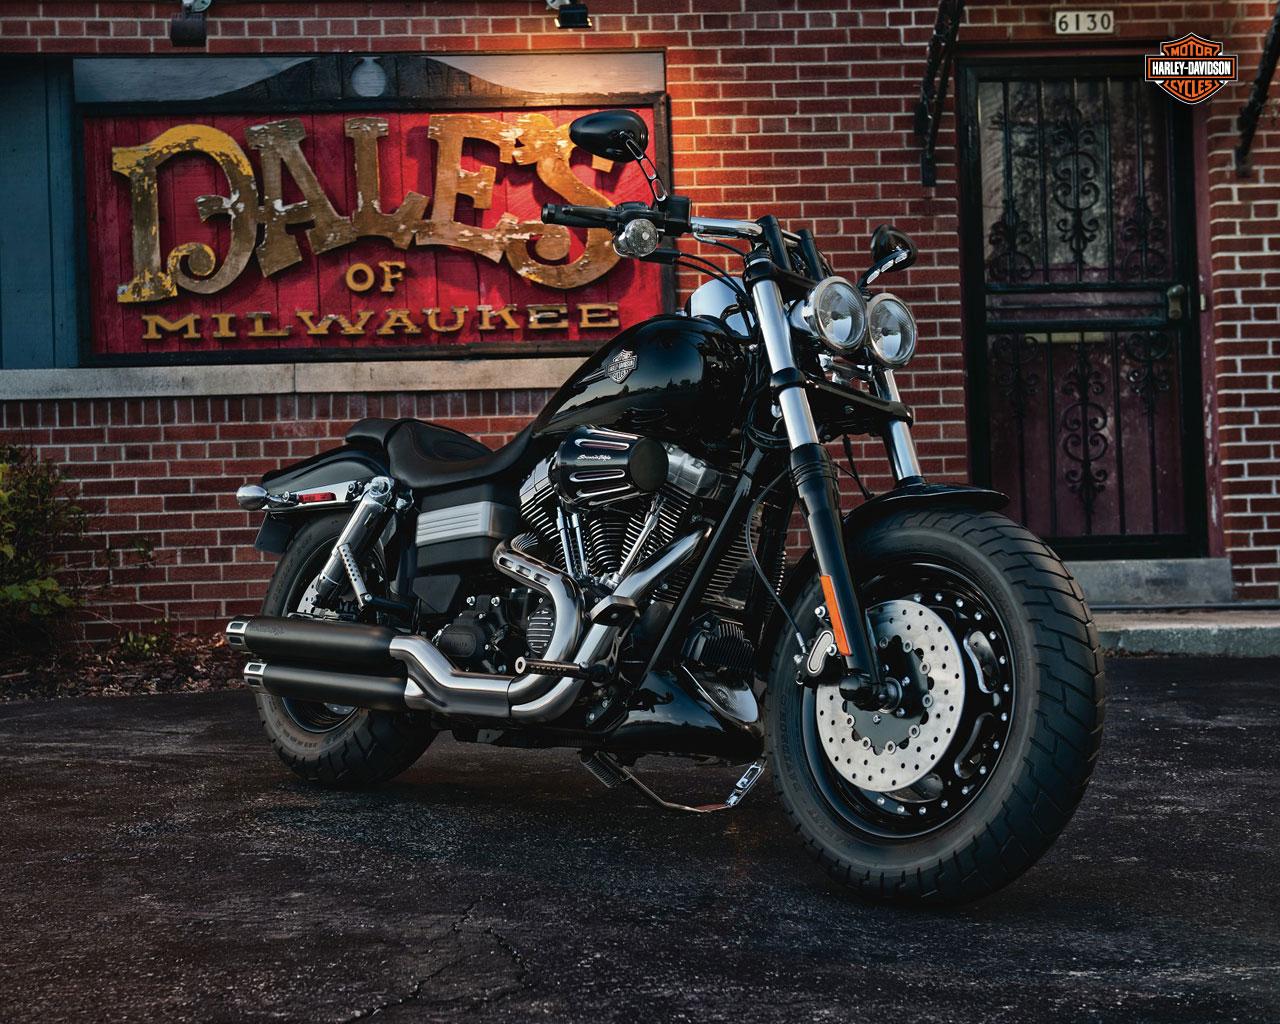 Harley Davidson Fat Bob Harley Davidson Fat Bob 1280x1024